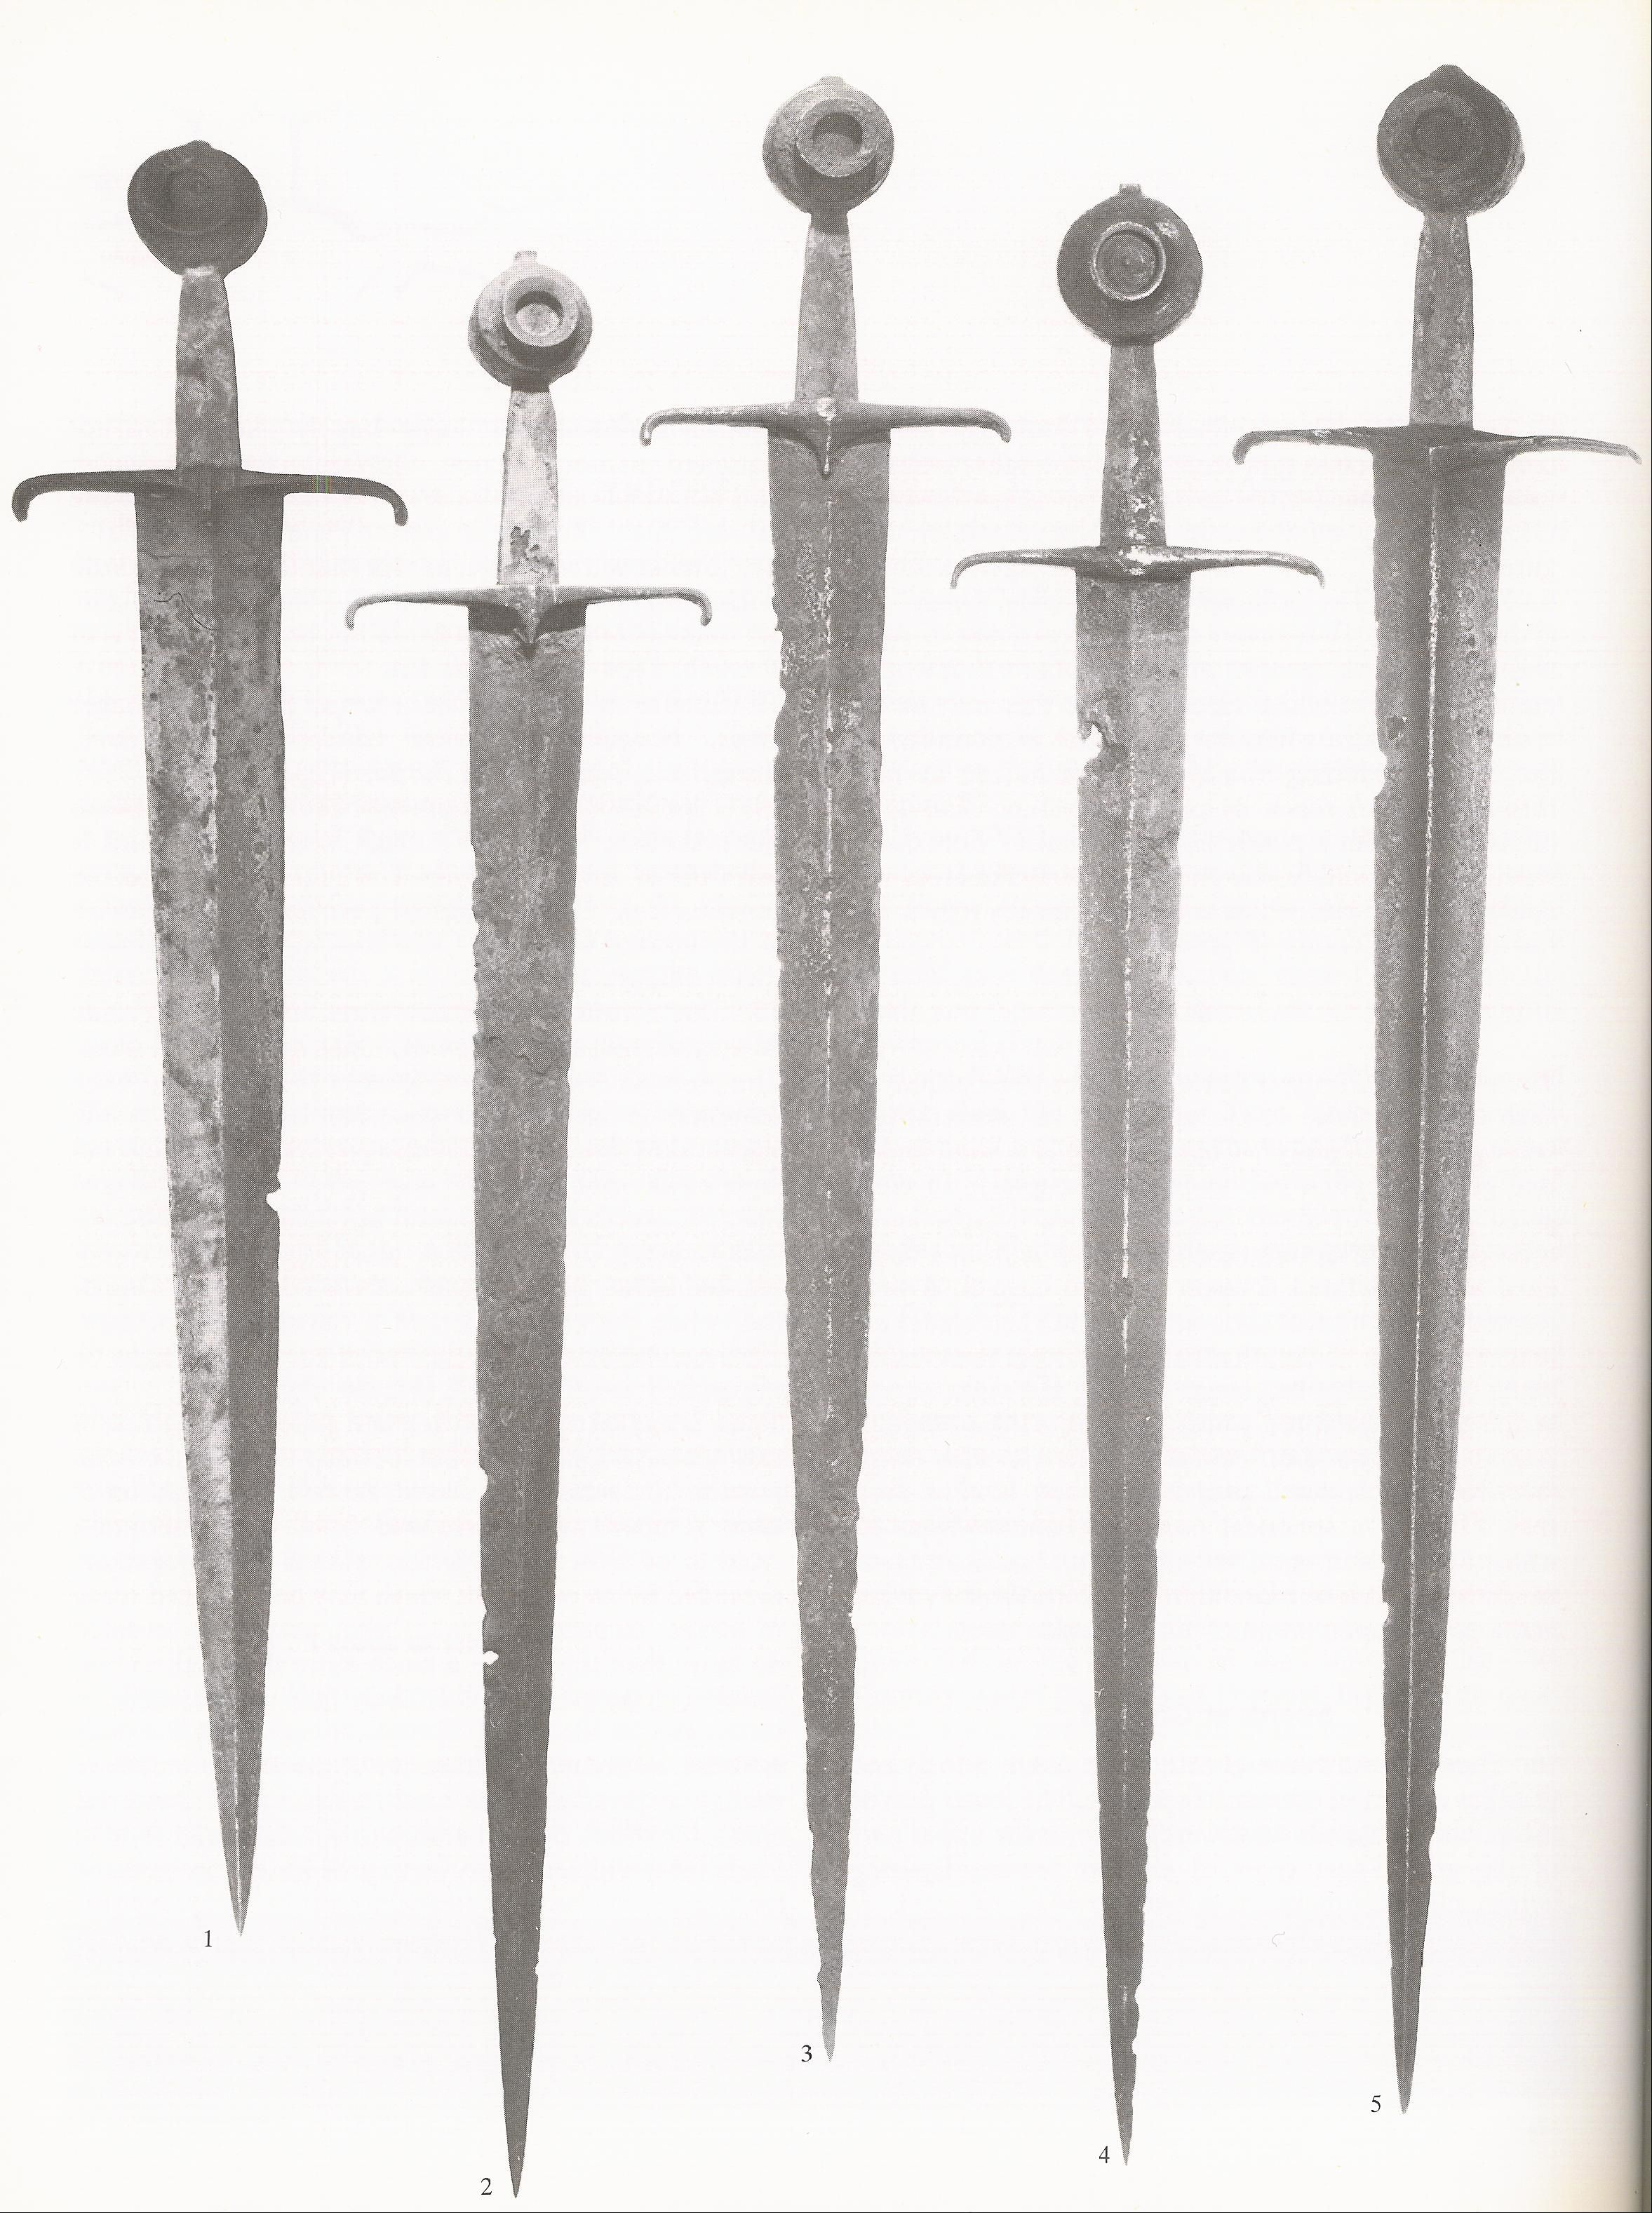 kingdom come deliverance how to change sword